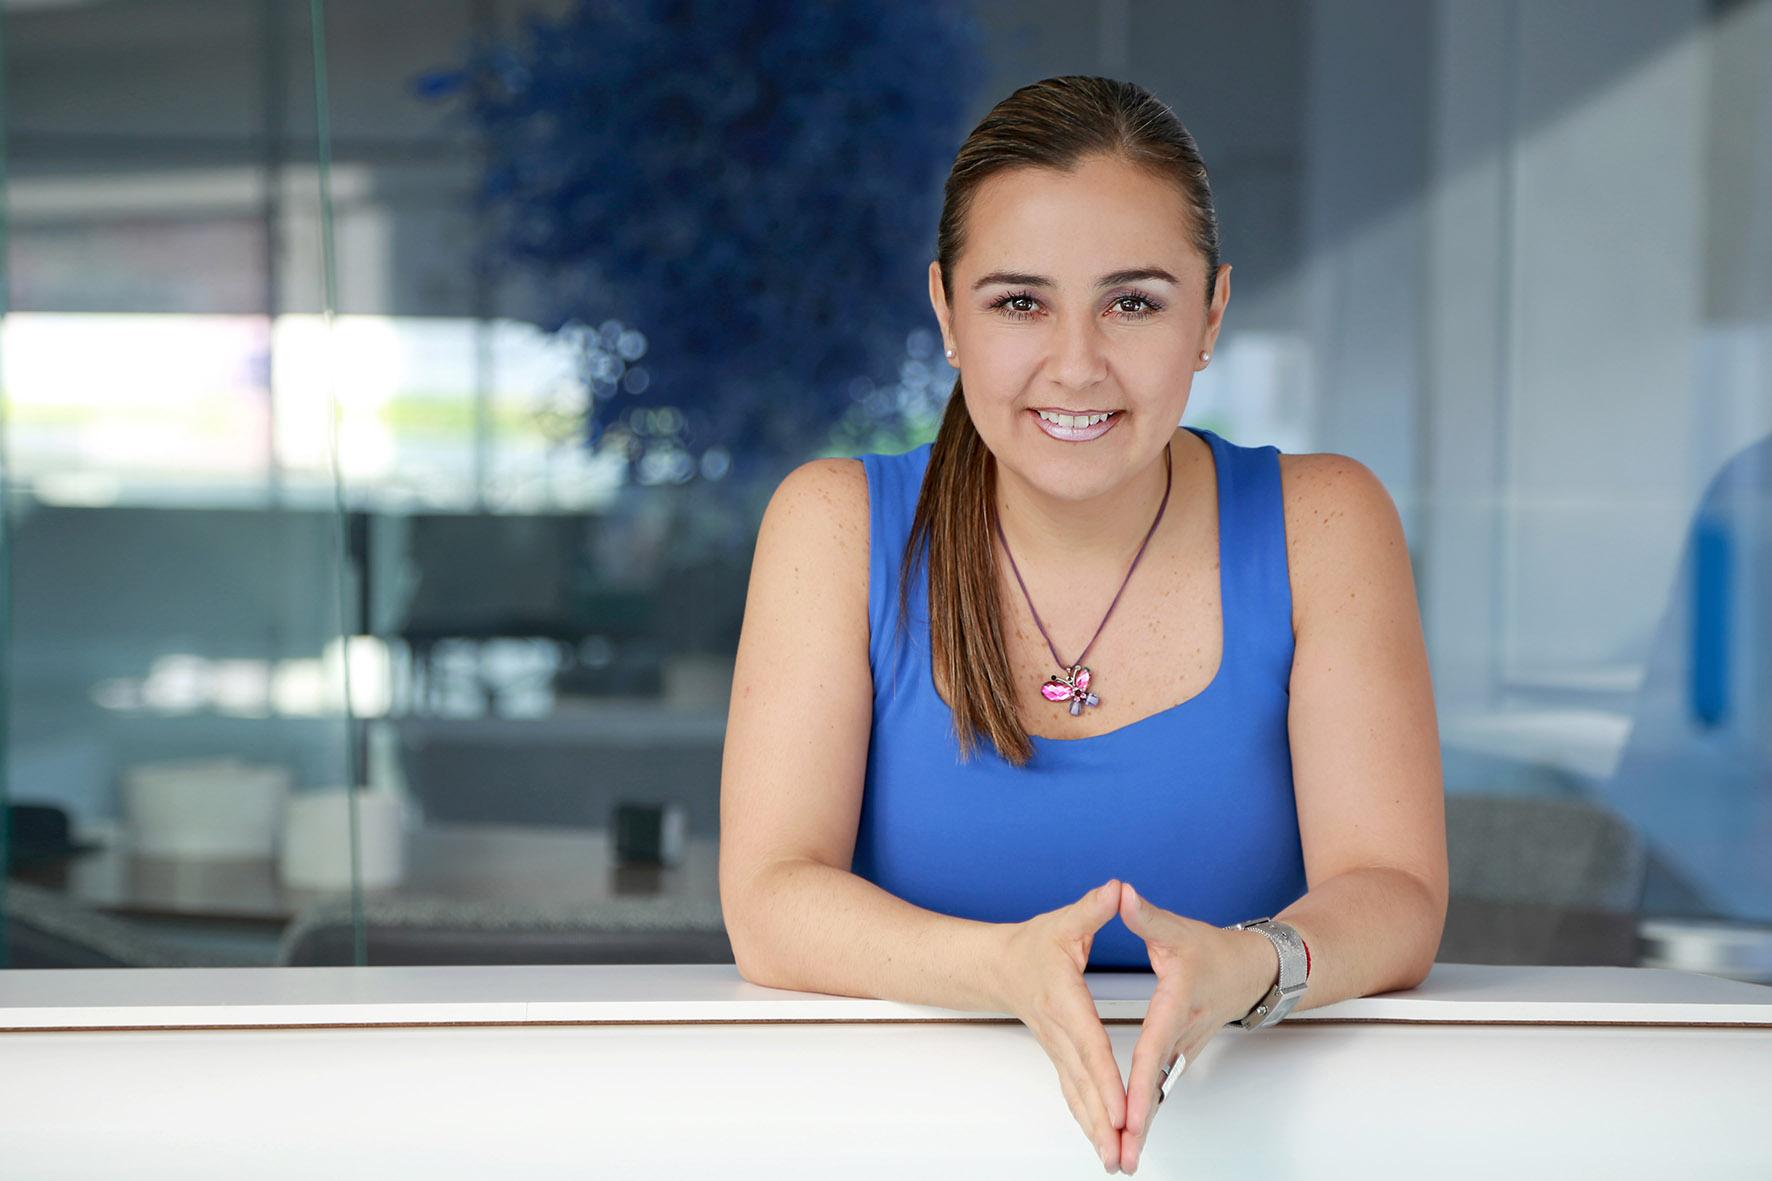 Ericka AMezcua, coach, terapeuta y capacitadora